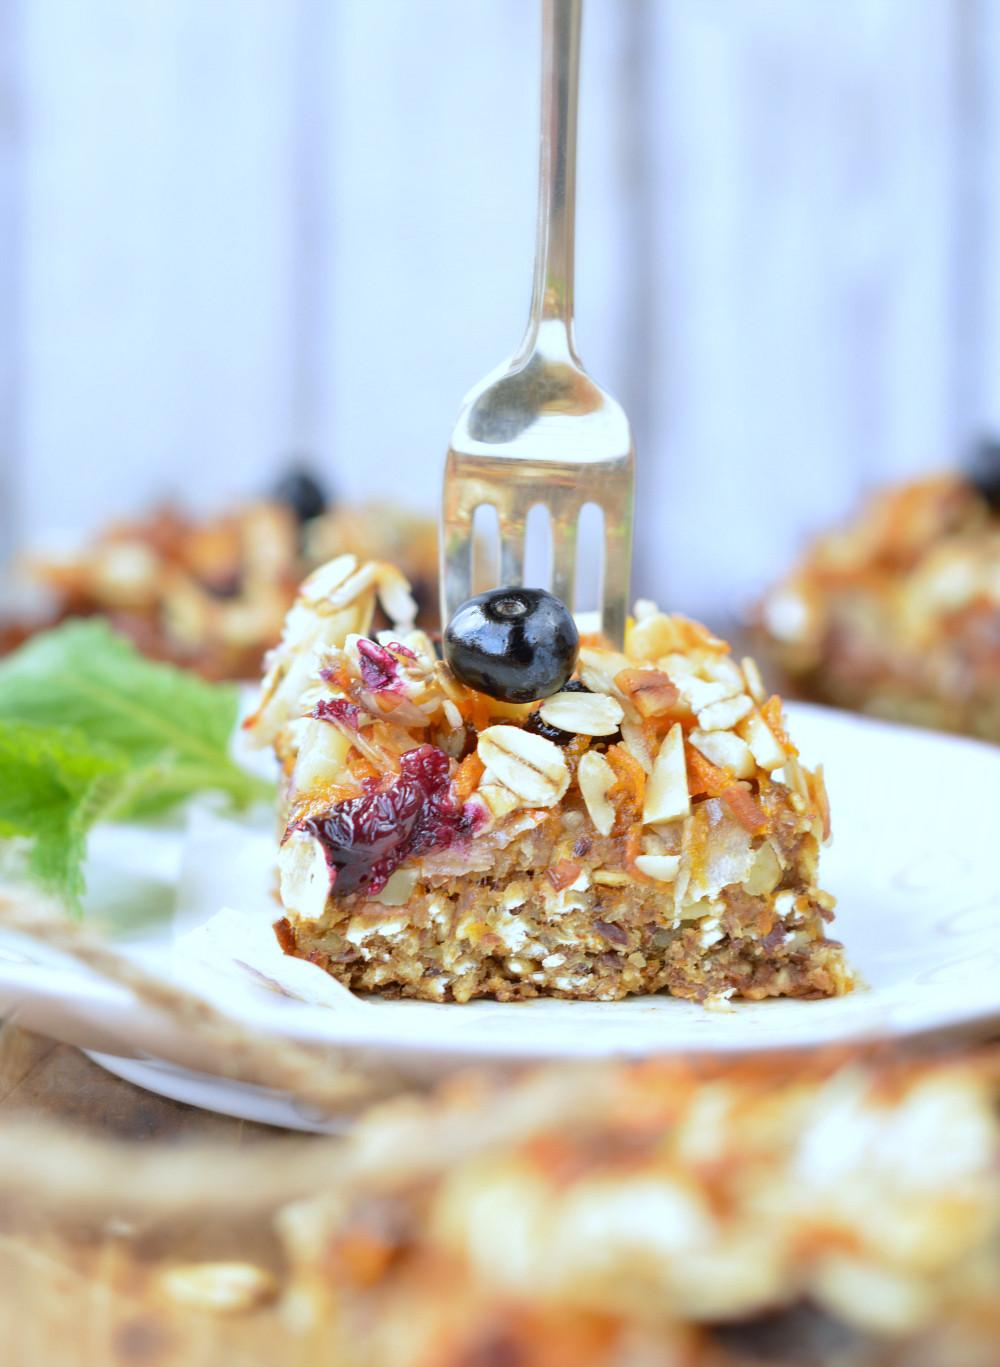 Healthy On The Go Breakfast Bars  Carrot Cake Baked Oatmeal Bars Healthy breakfast